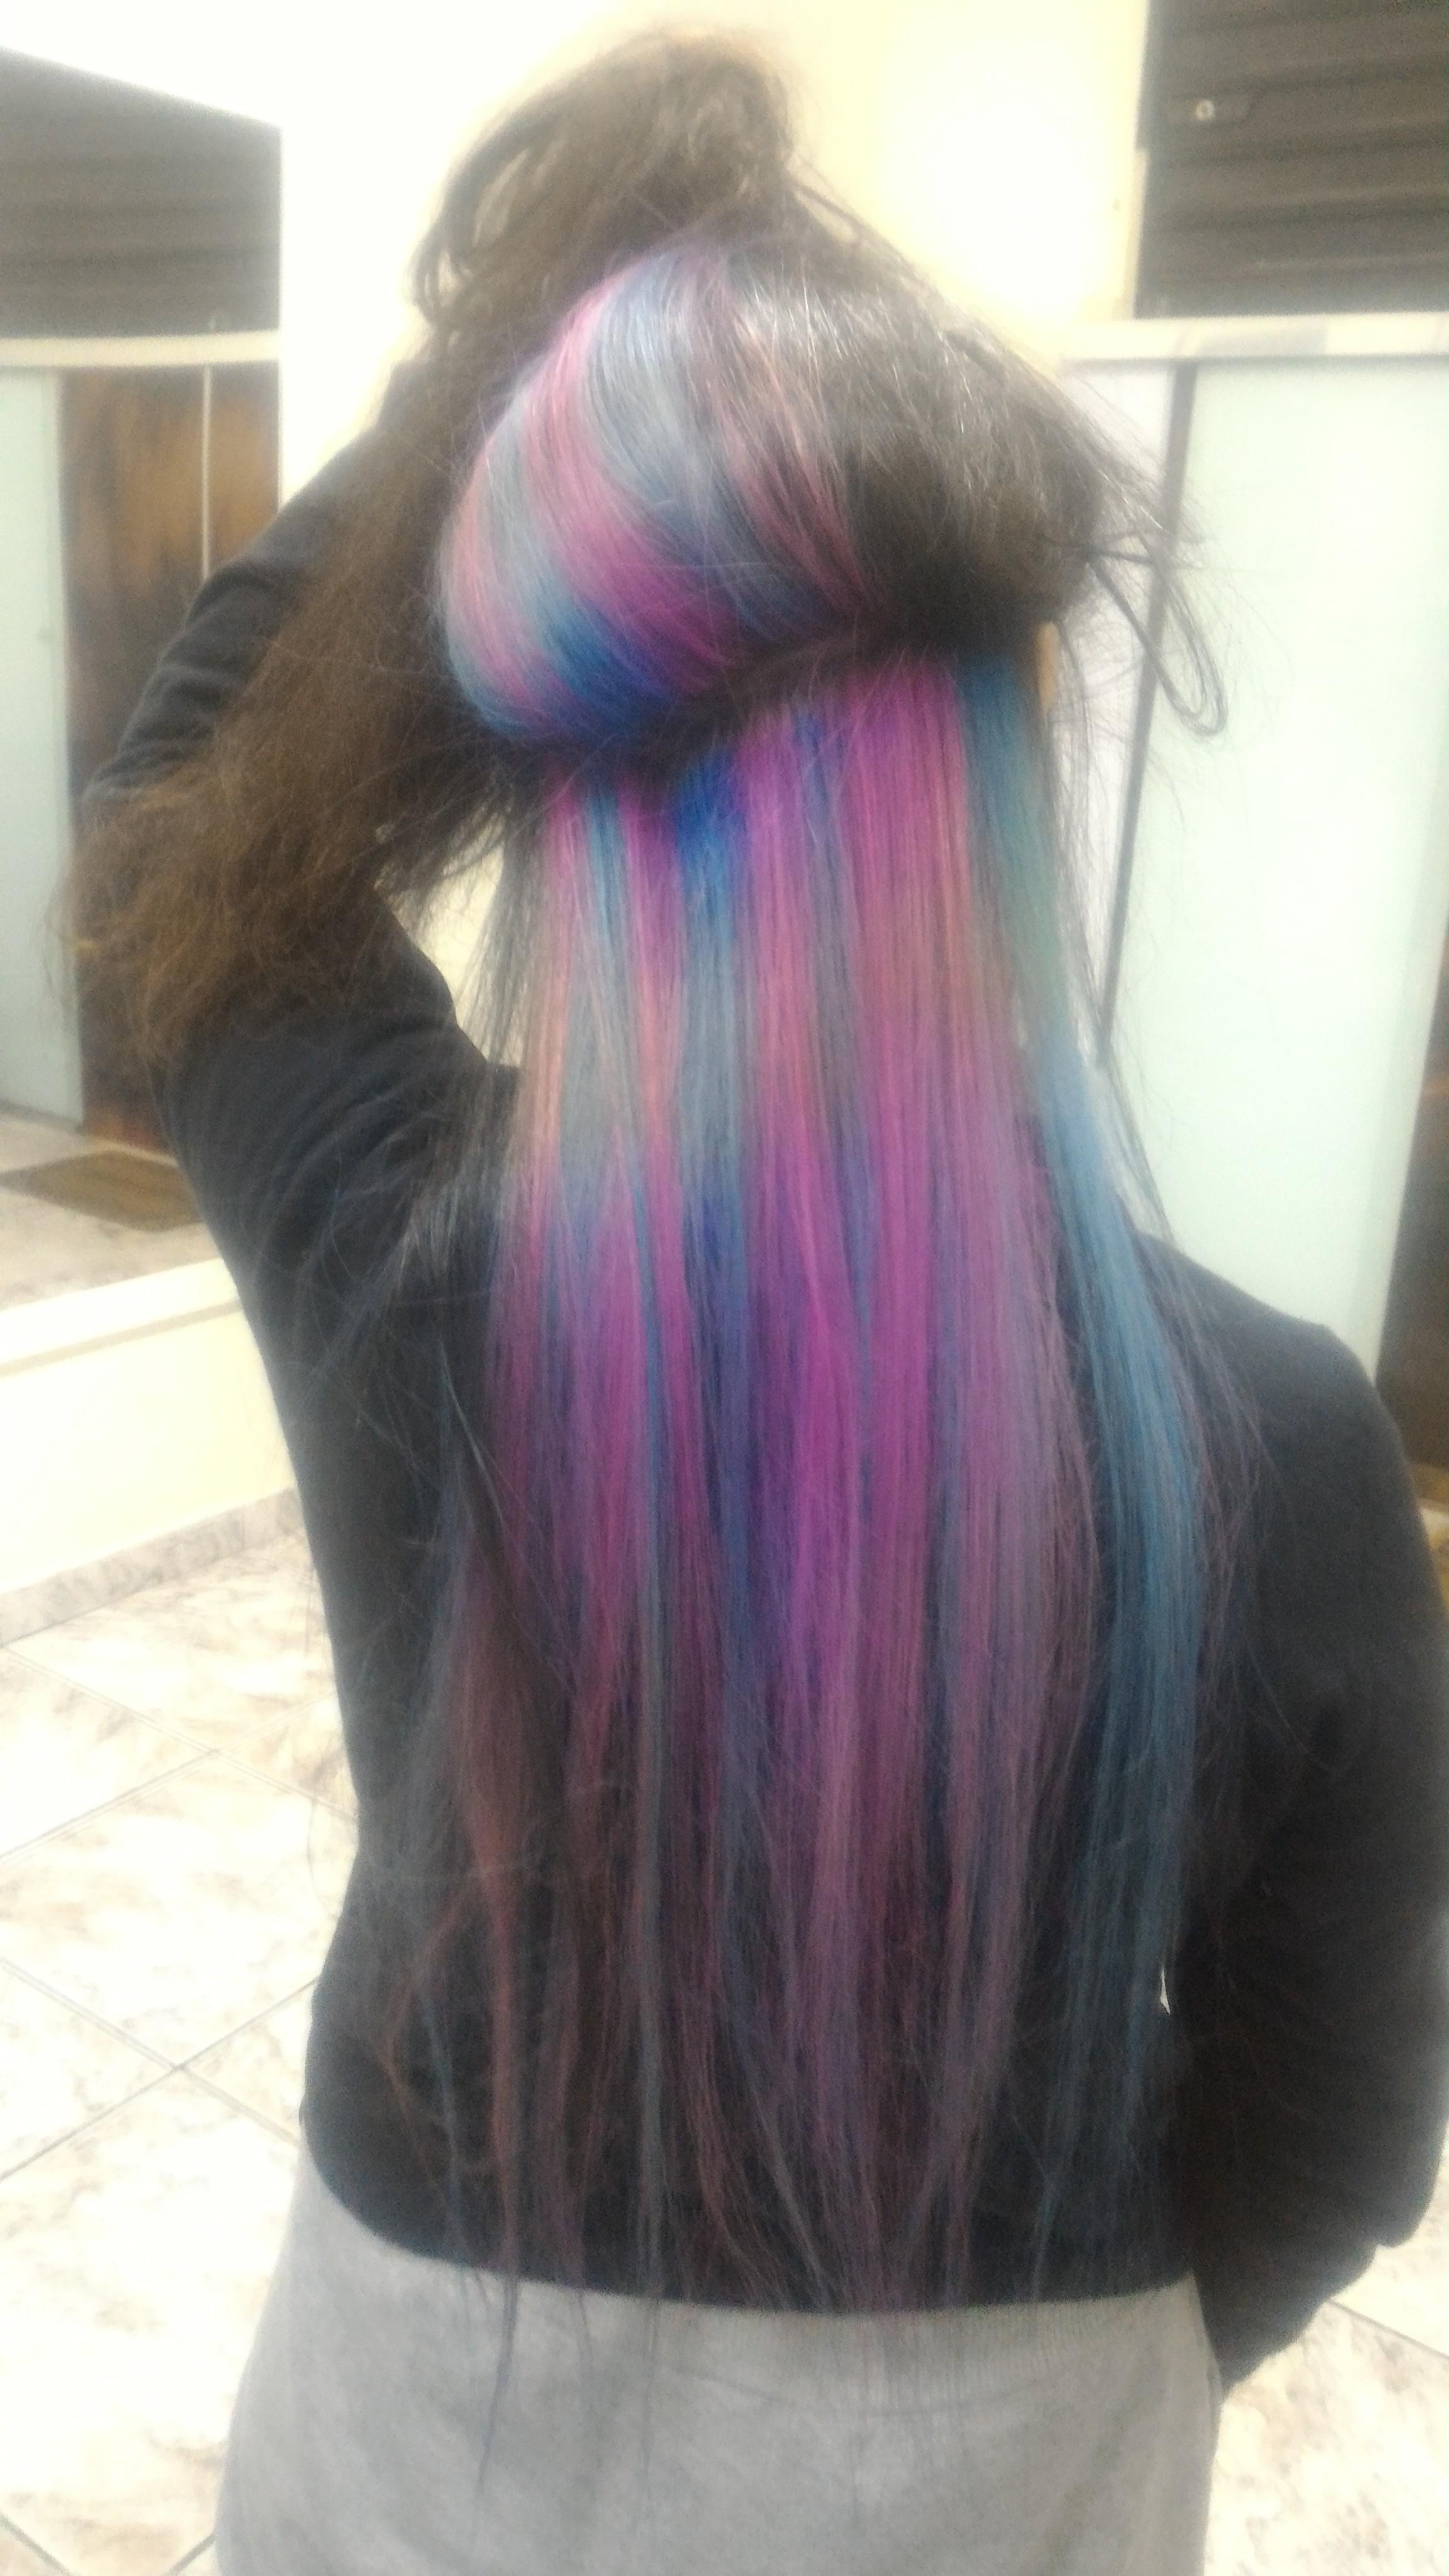 Cor fantasias 😍 cabelo auxiliar cabeleireiro(a) escovista recepcionista